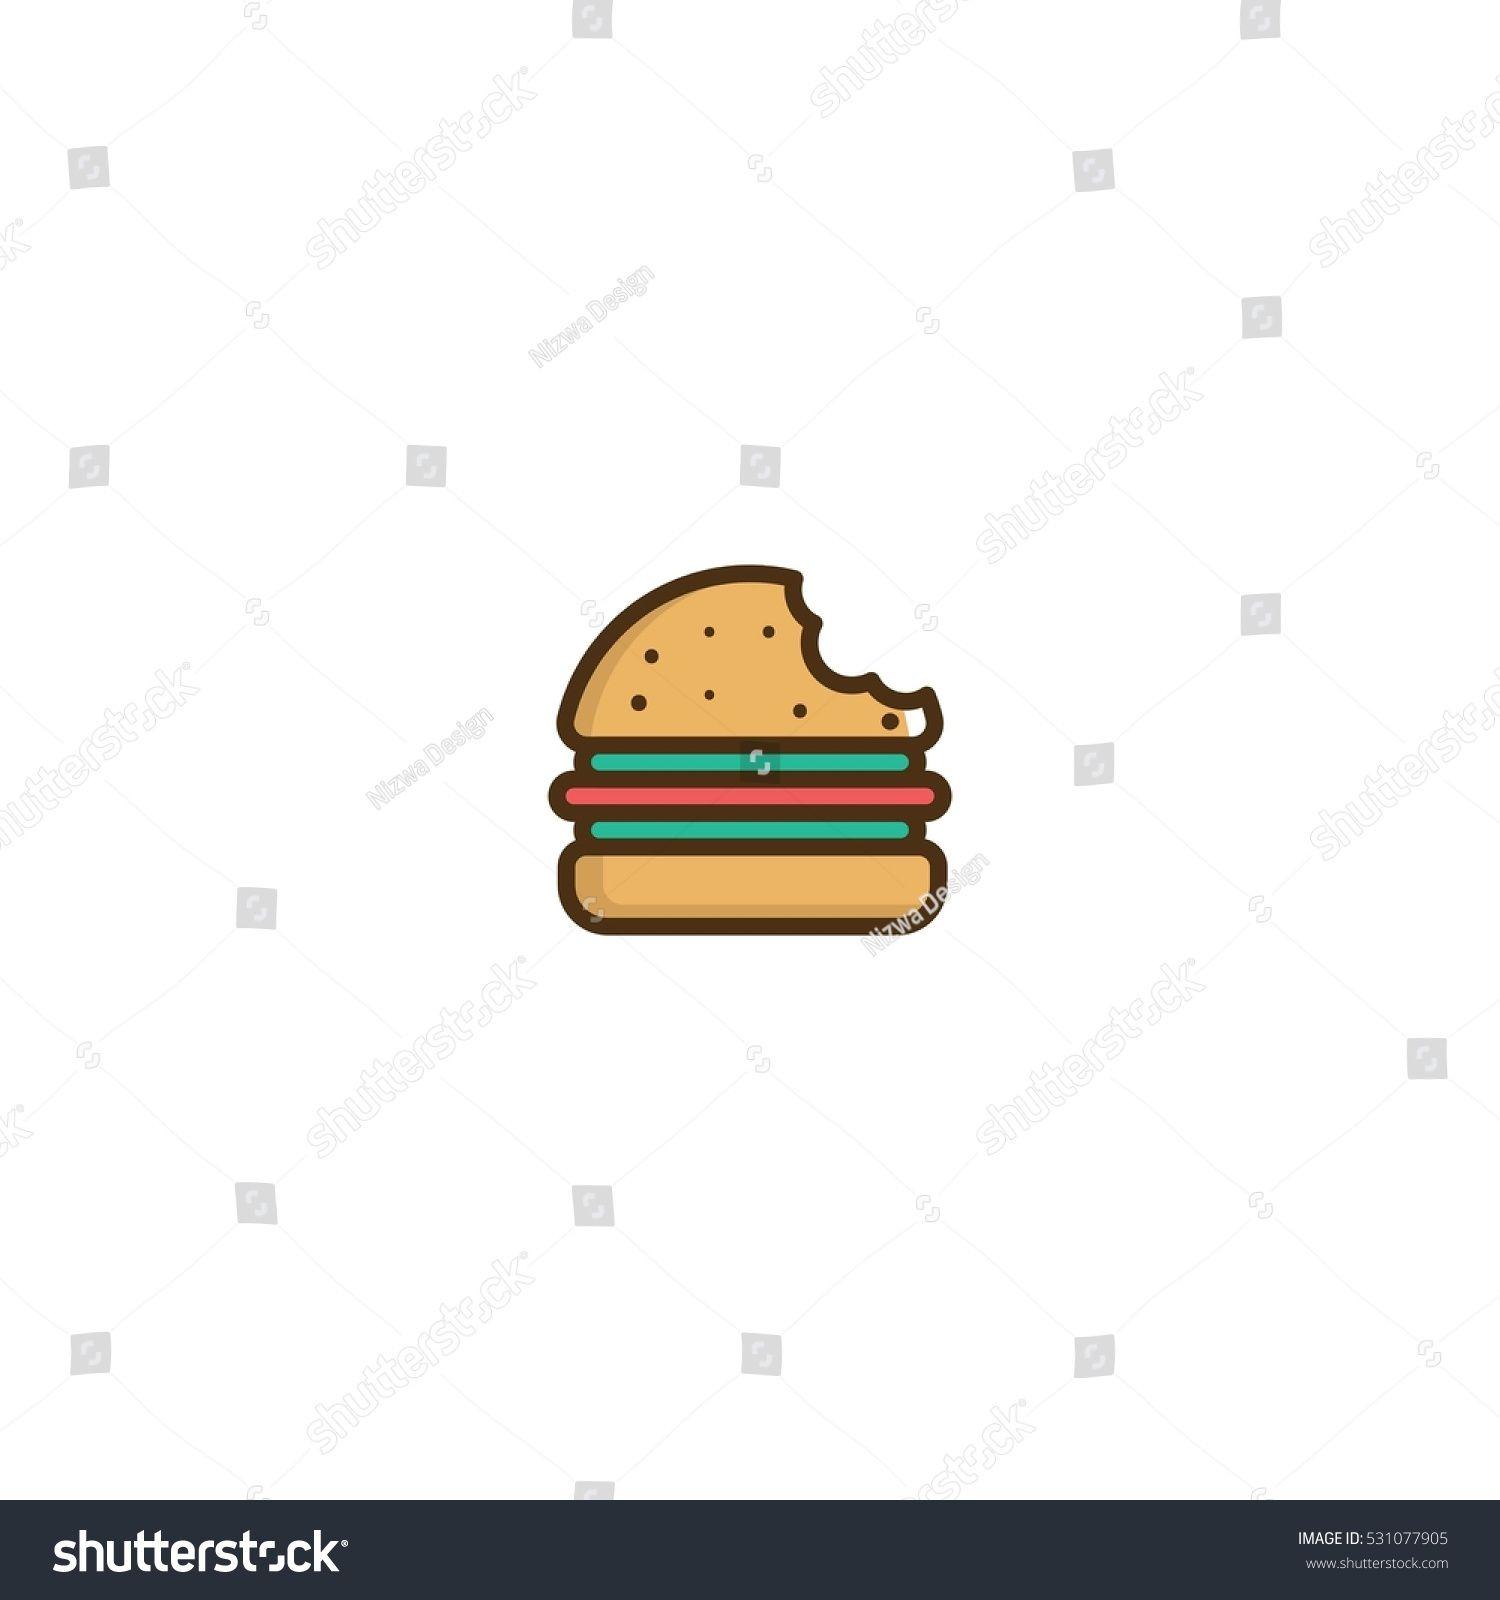 banner freeuse stock Vector burger bite. Logo design element unique